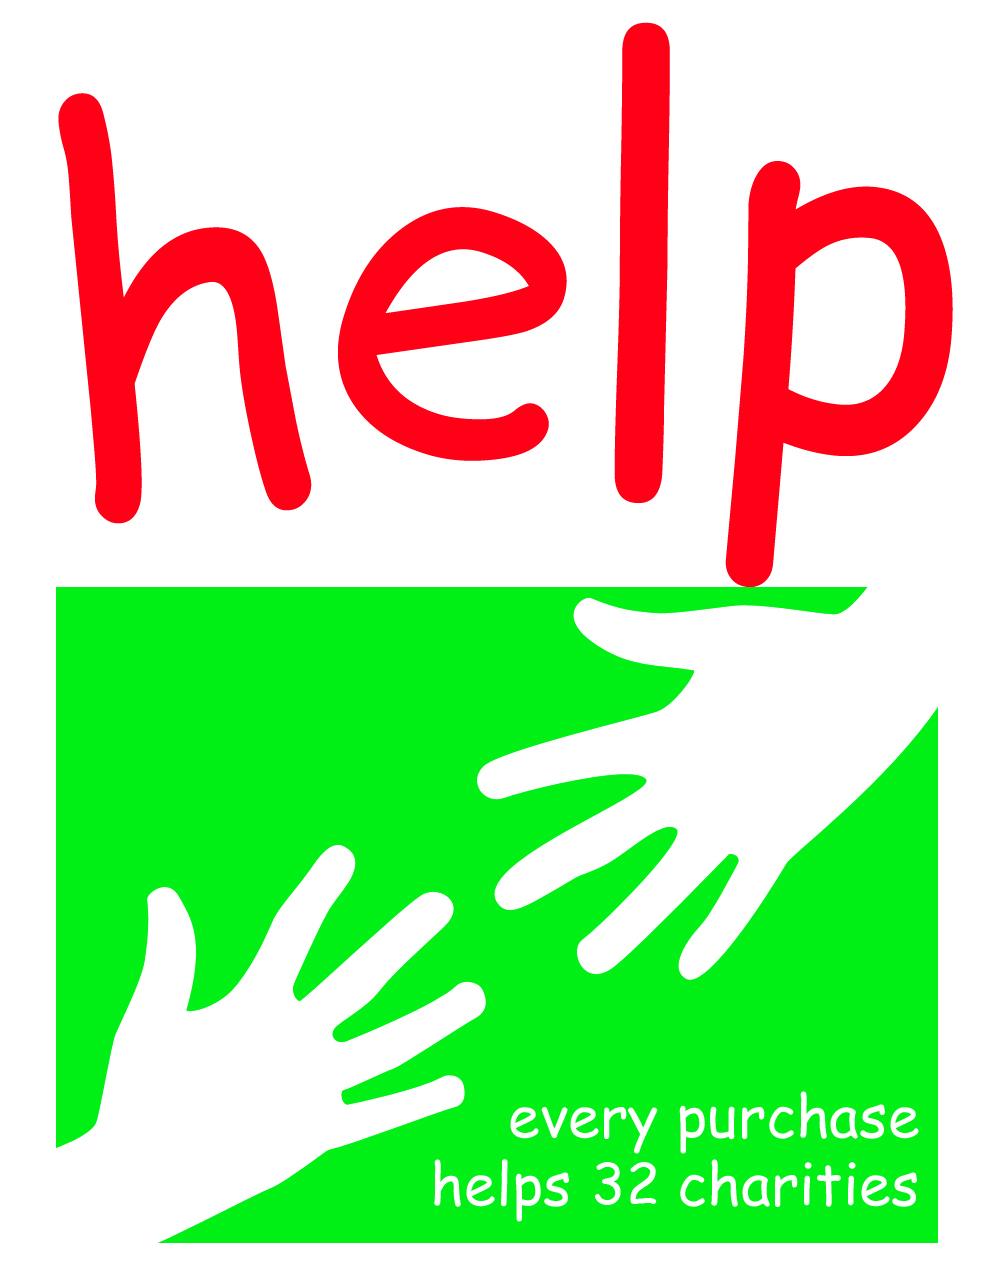 Above: Noel Tatt has raised over £1.7 million for Helpcards since 2001.